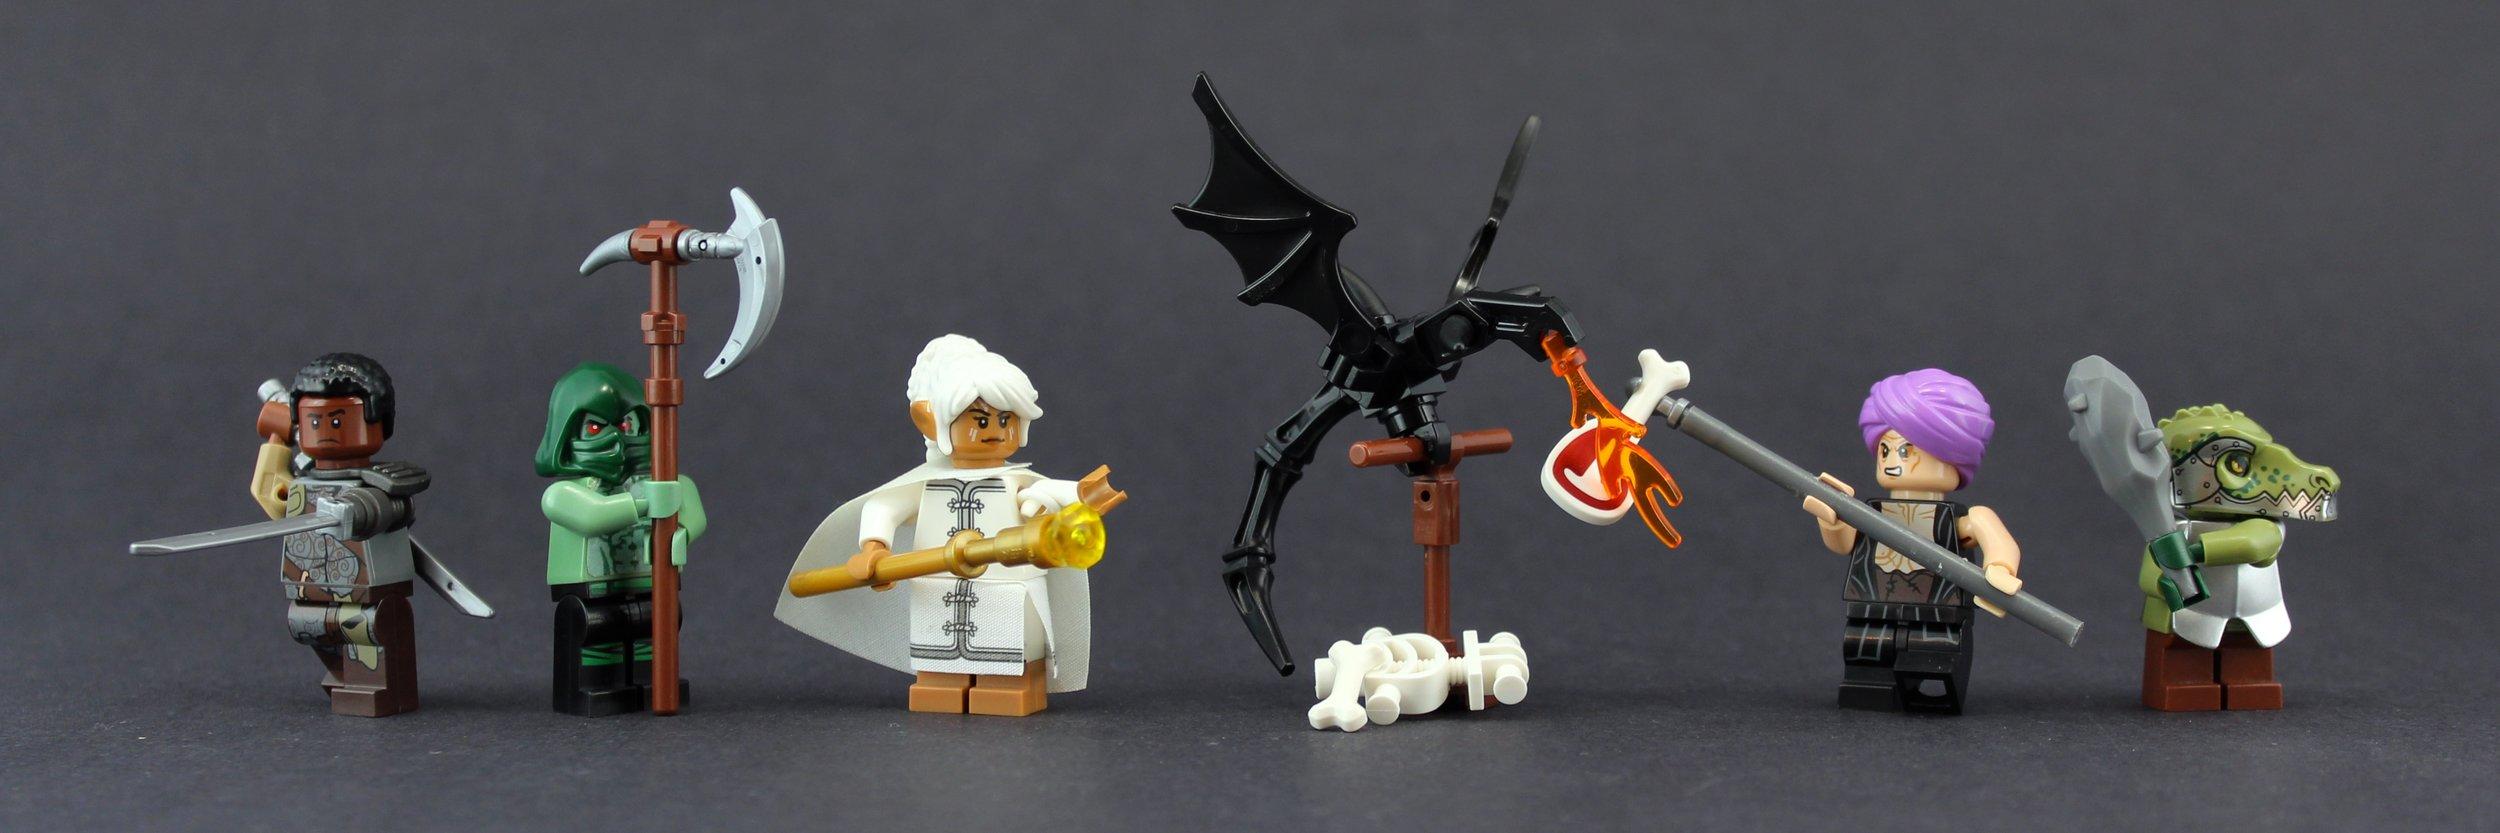 Dragon Lands Figbarf 4.JPG